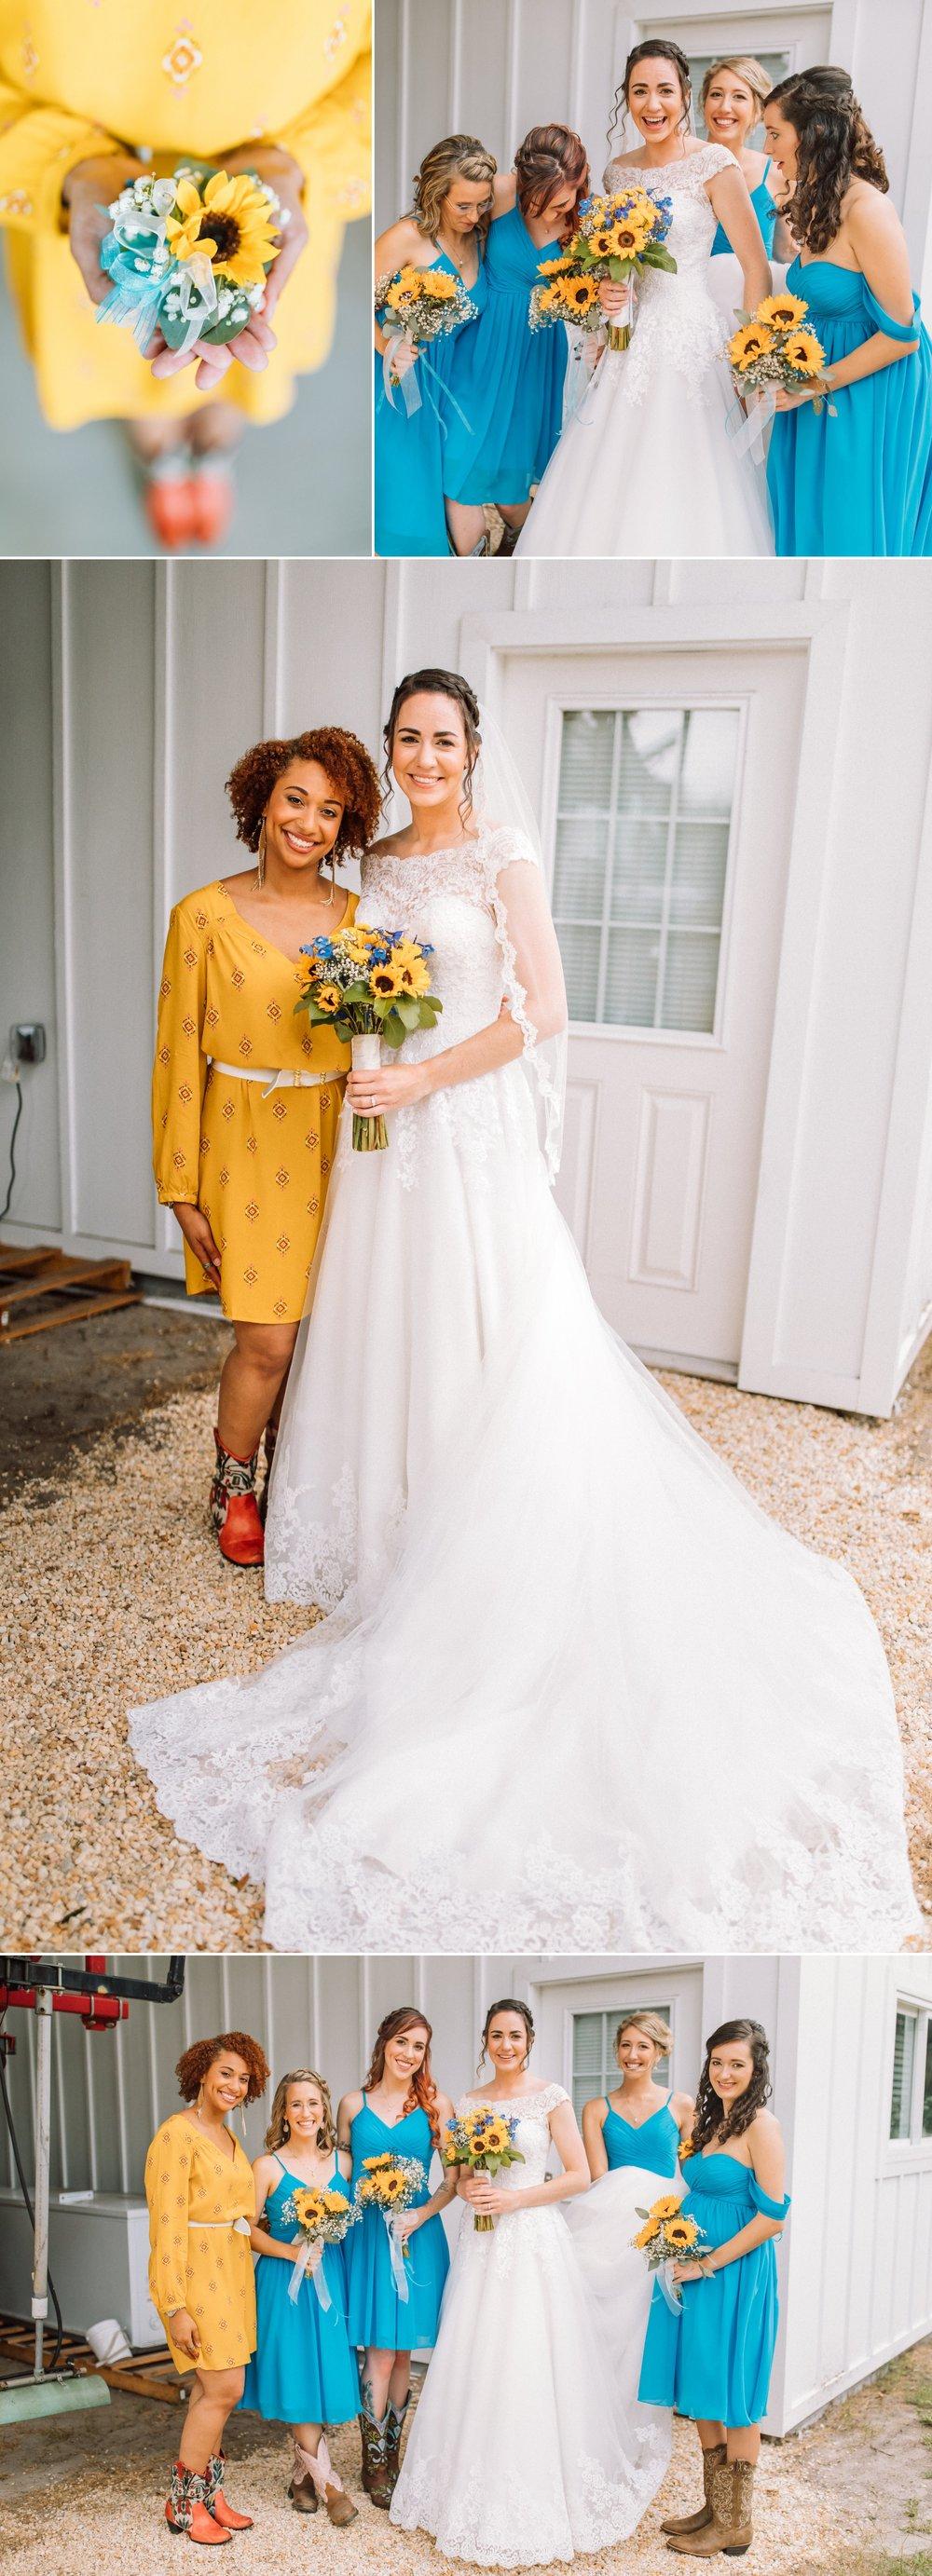 Rustic Sunflower & Blueberry Barn Wedding- Ever After Farms - Allie & NickBlog 11.jpg